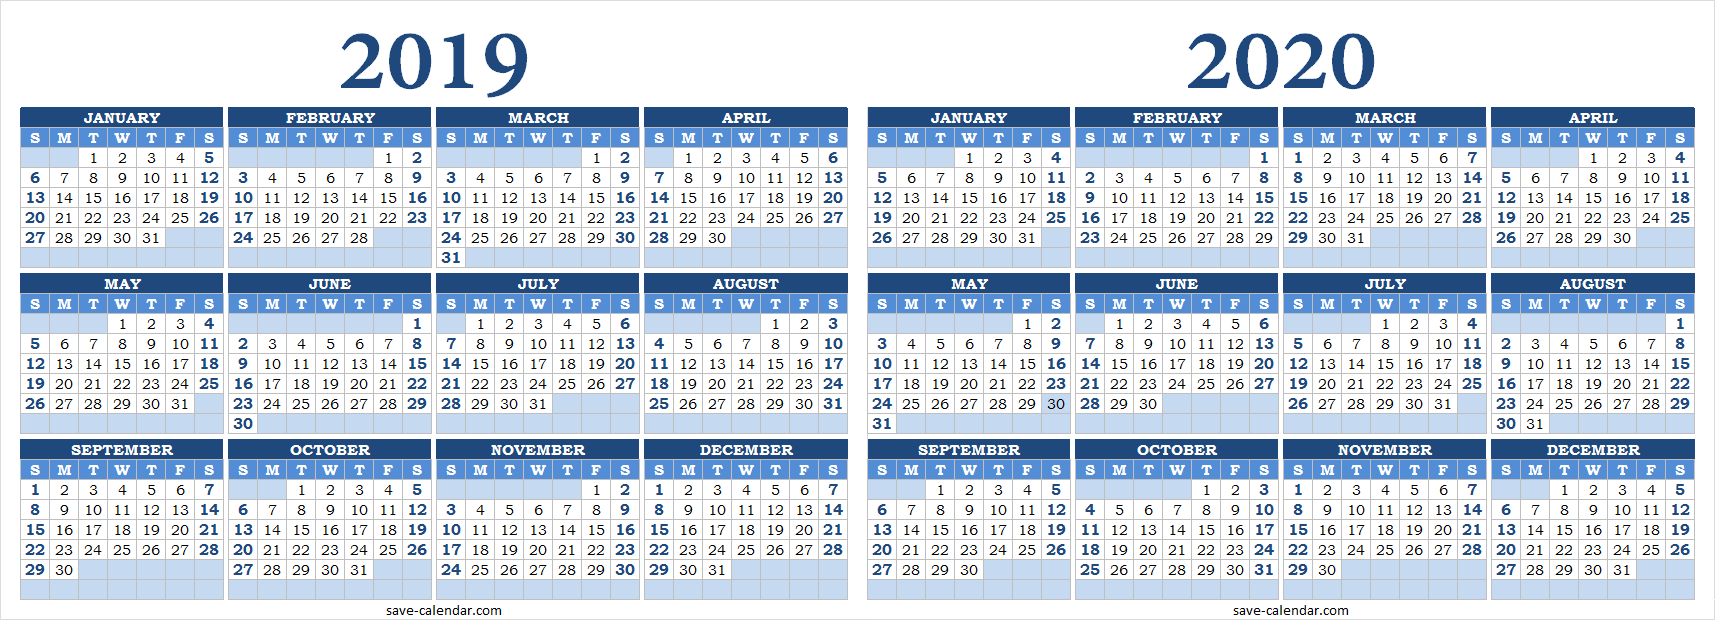 Schedule Calendar 2020 2019 2020 Calendar Blank | 2019 Calendar | Templates printable